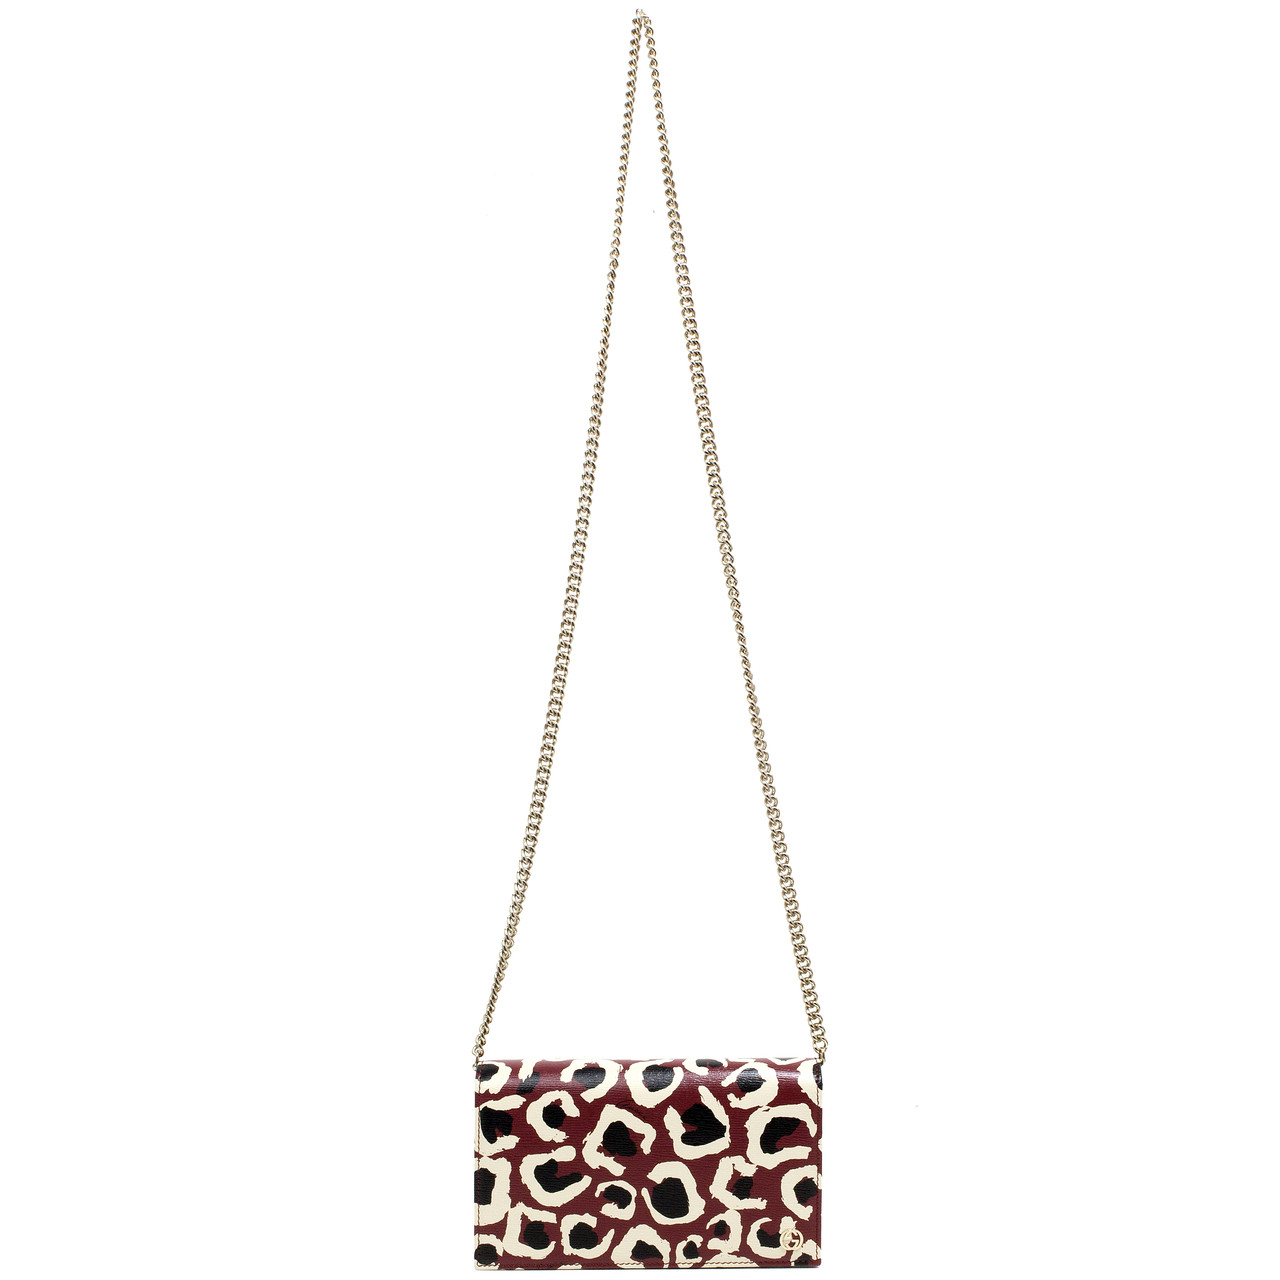 ea80a0fbdc29 Gucci Leopard Print Calfskin Betty Chain Wallet - modaselle